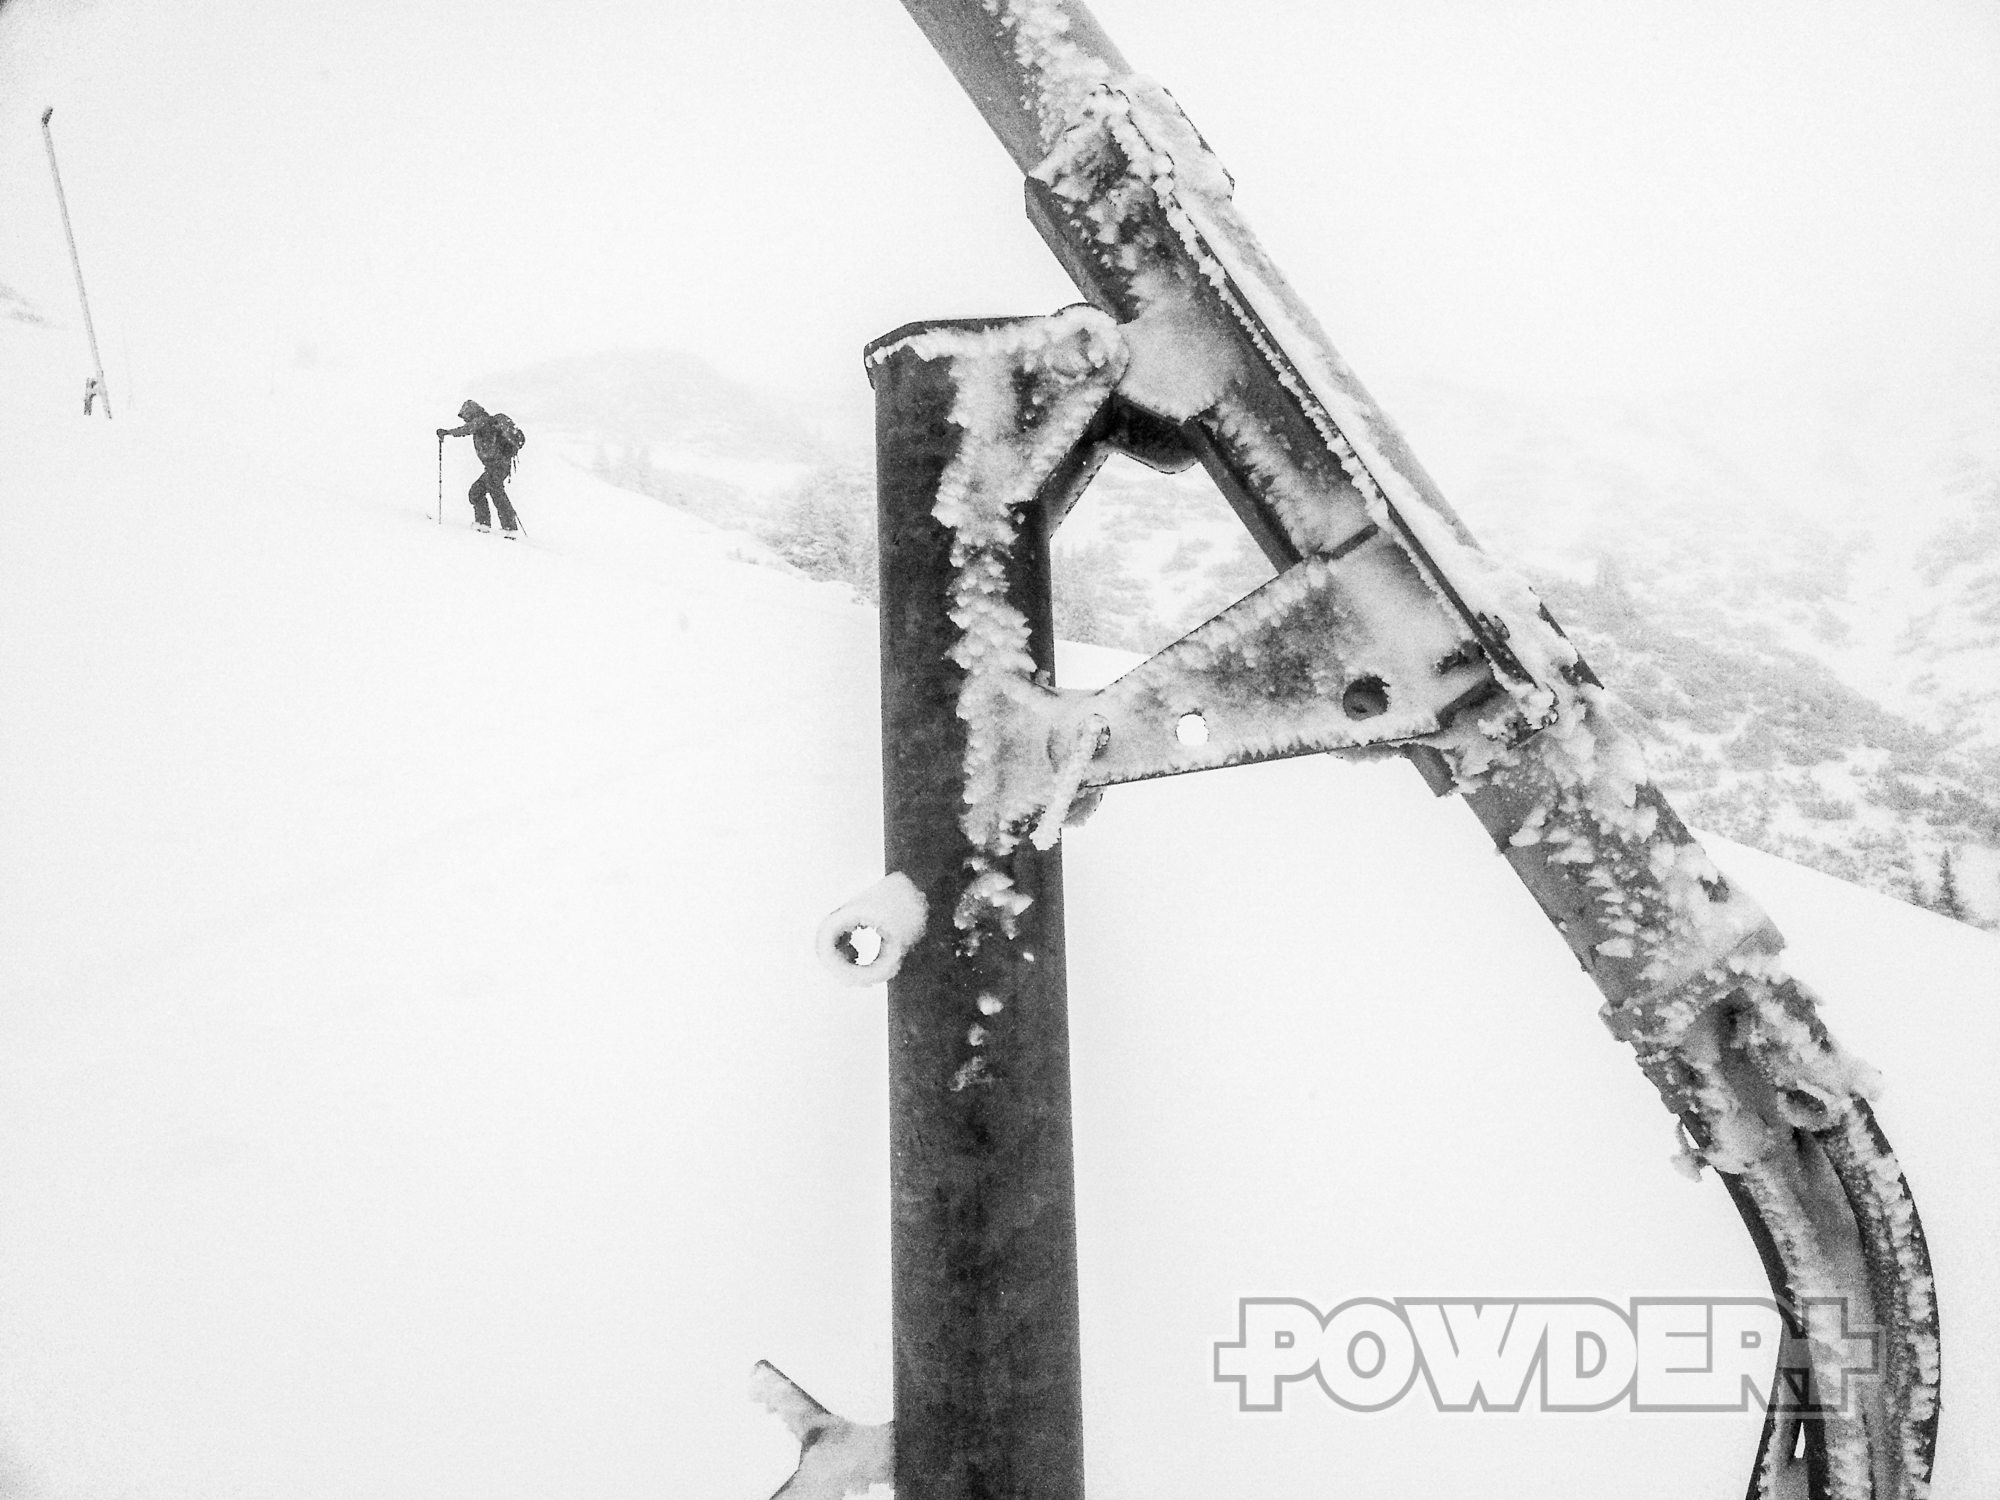 Skitour, Frühwinter, Seefeld, Tirol, Powder, Frau Holle, Schneekanone